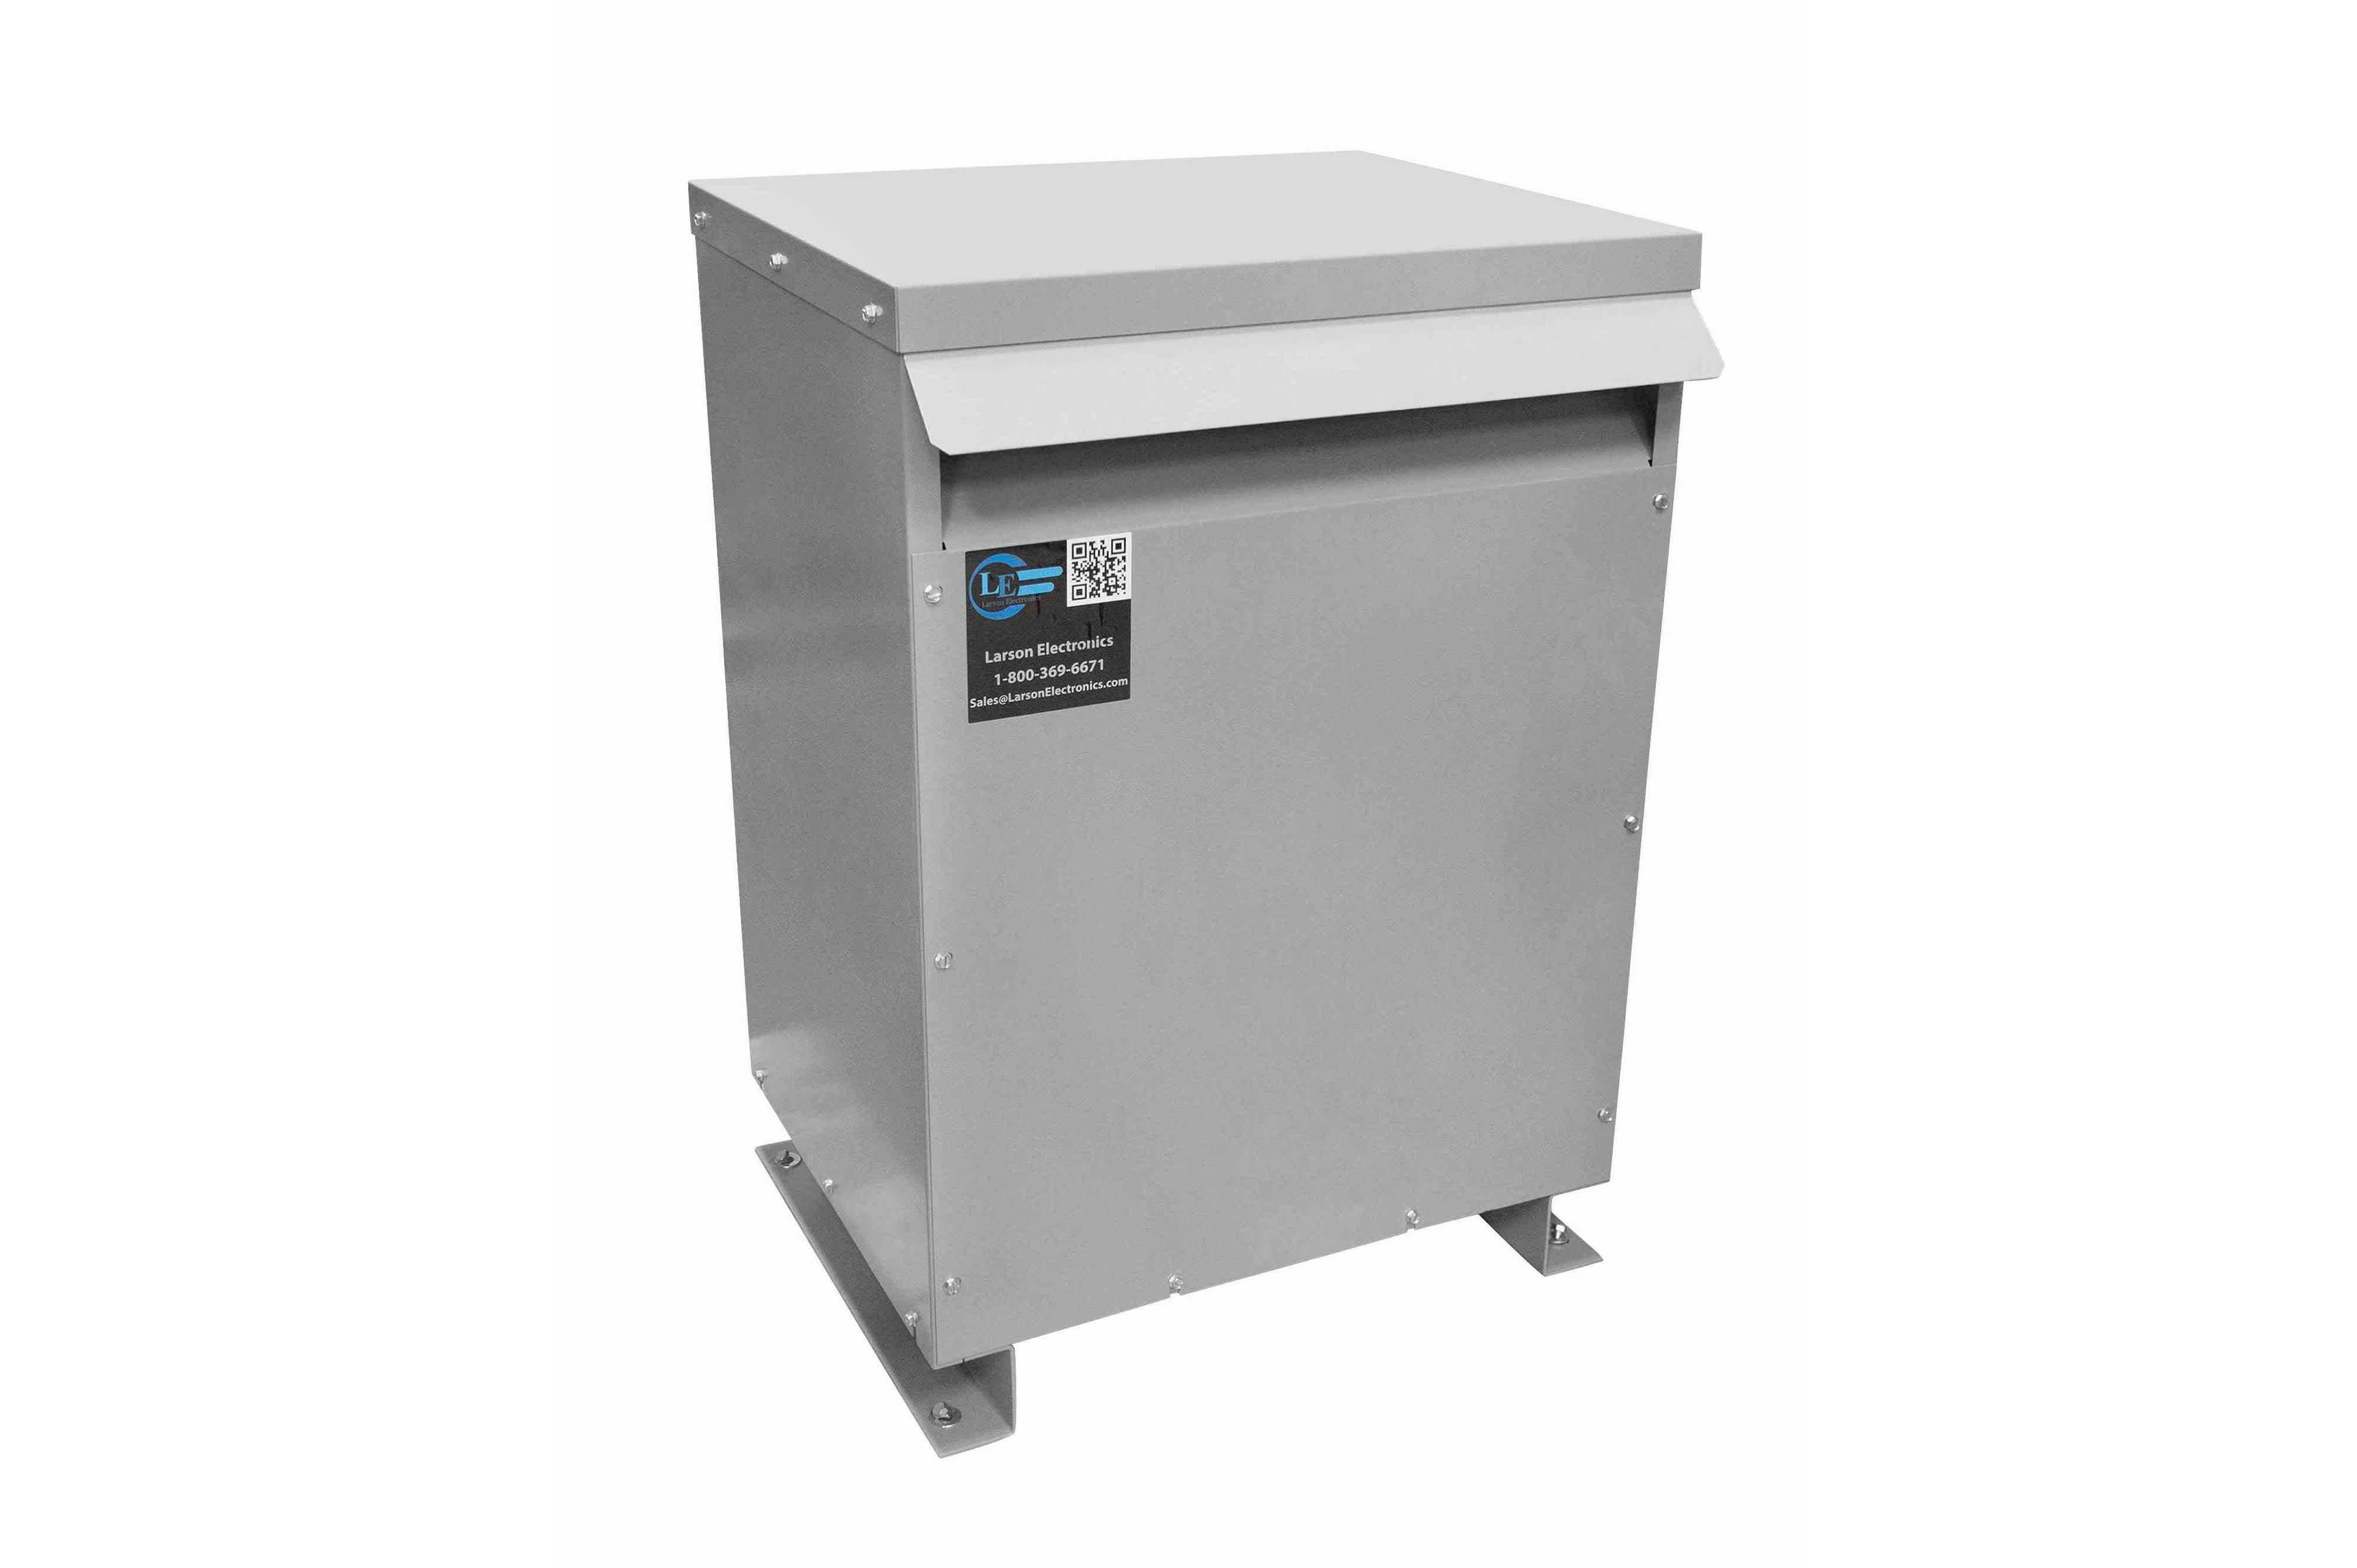 28 kVA 3PH Isolation Transformer, 600V Wye Primary, 460Y/266 Wye-N Secondary, N3R, Ventilated, 60 Hz